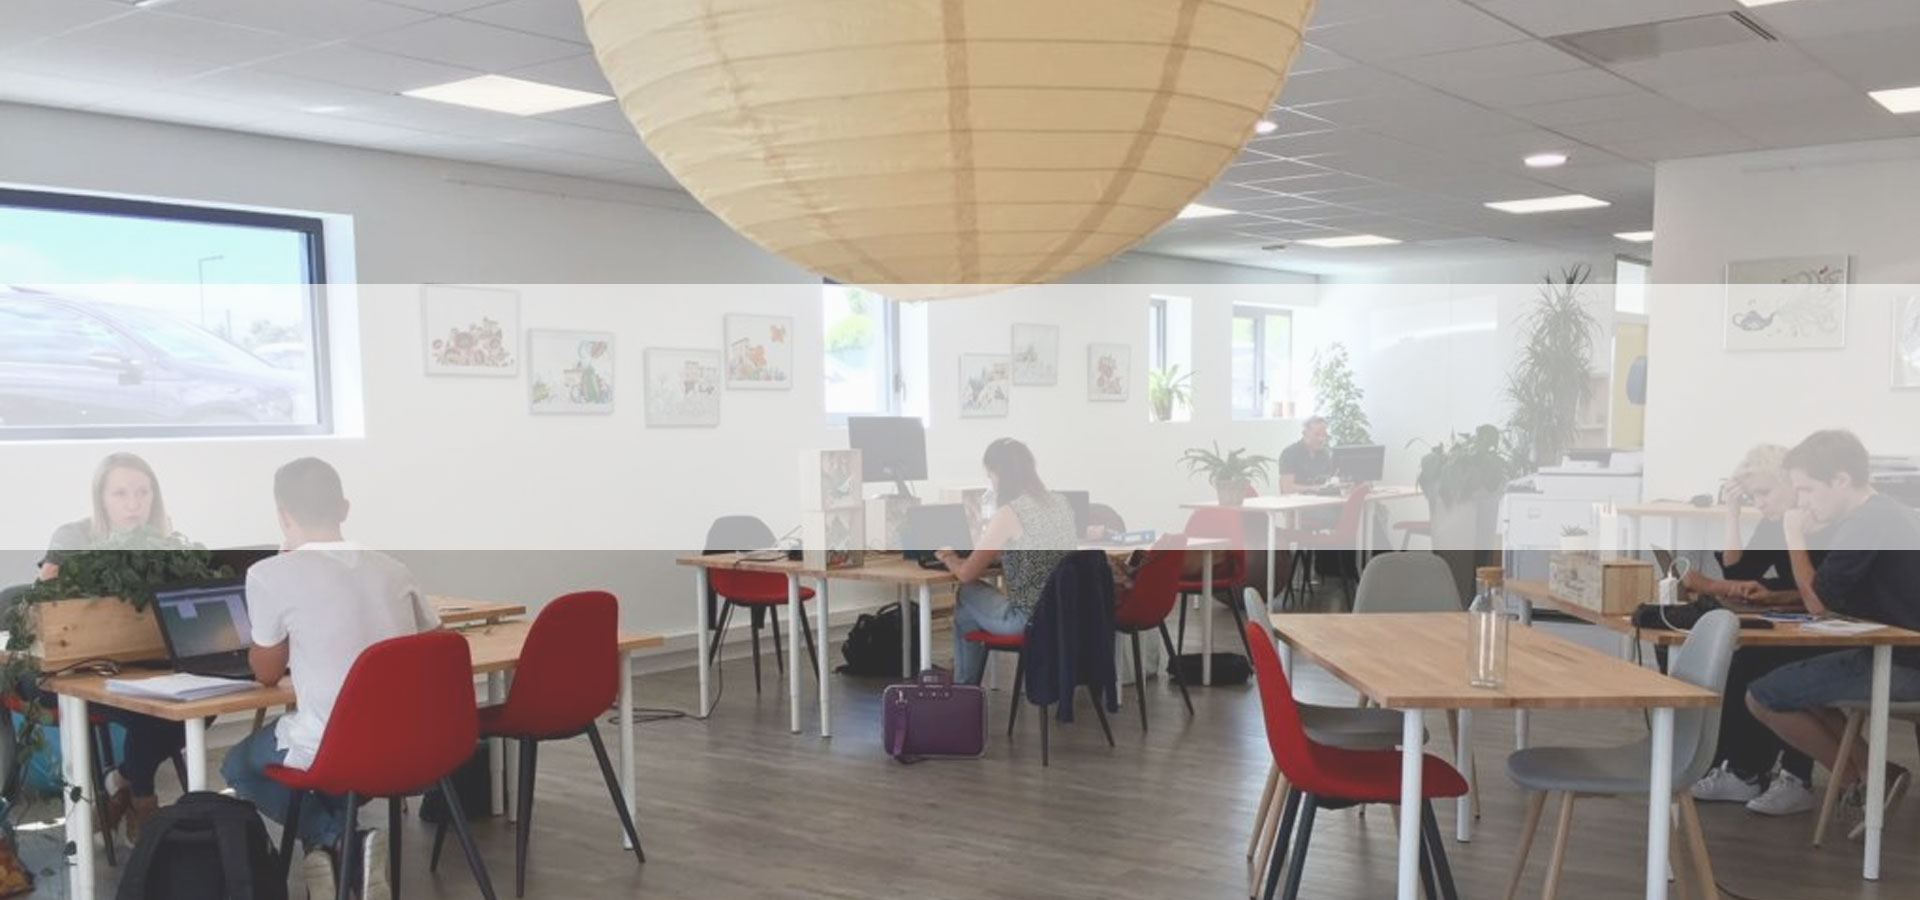 Espace de coworking O'Village à St Just St Rambert